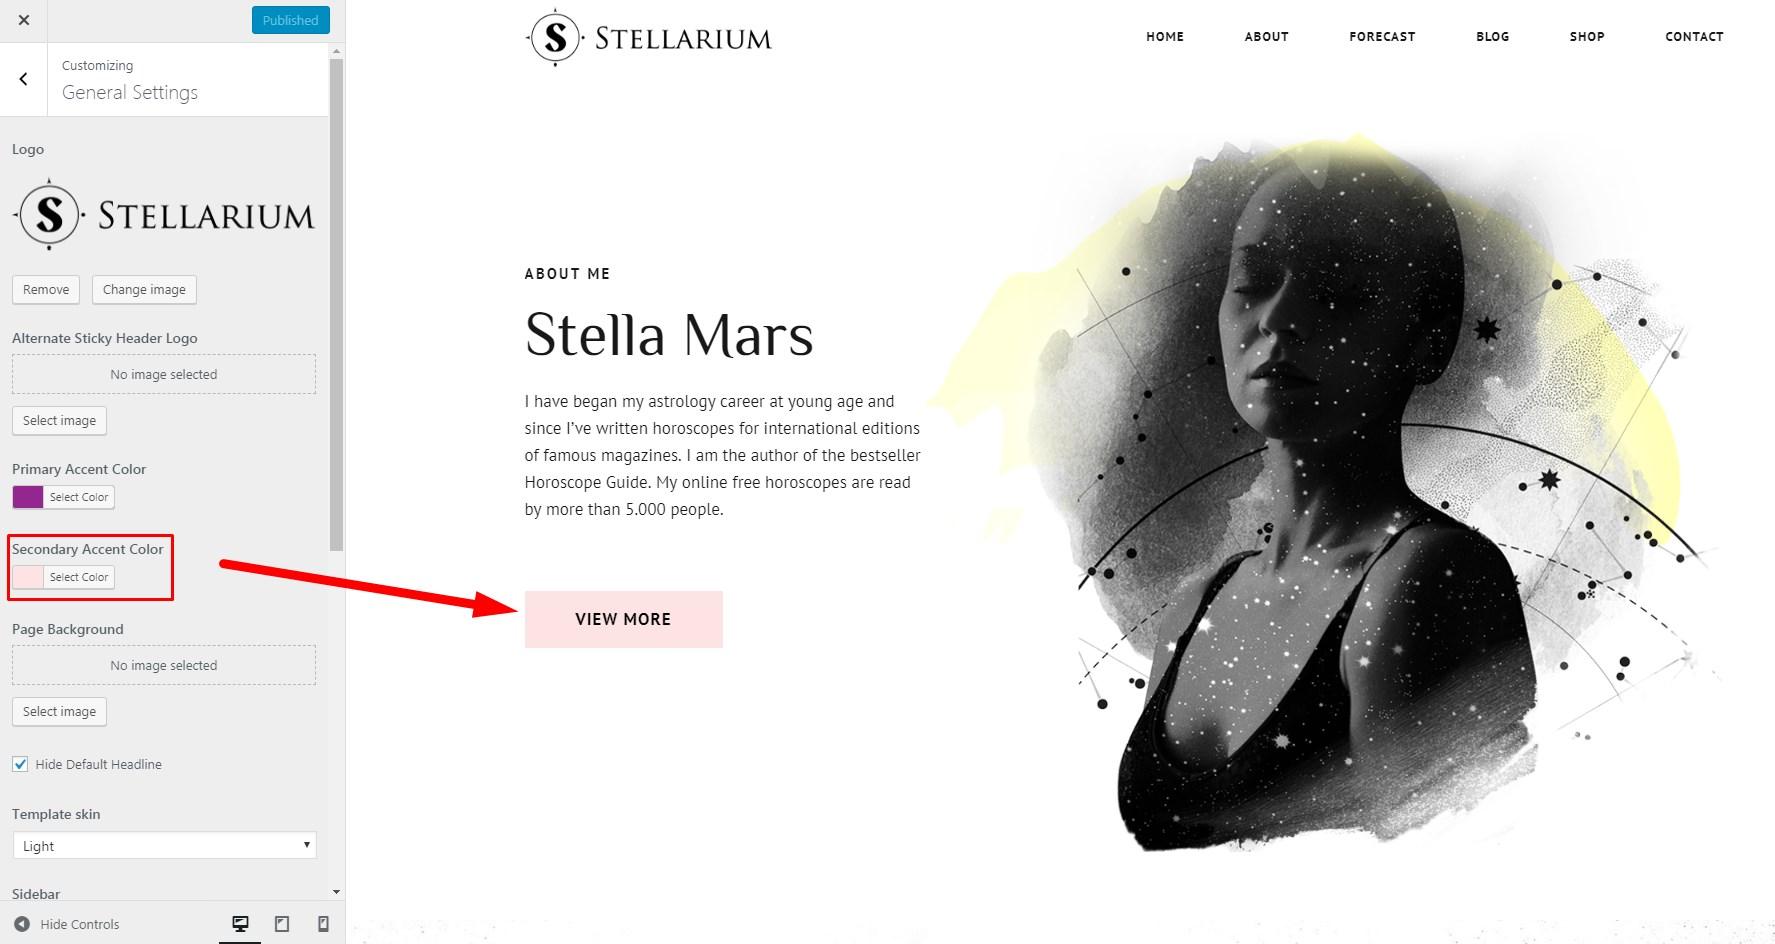 https://documentation.bold-themes.com/stellarium/wp-content/uploads/sites/34/2018/06/stellarium-customize-03.jpg